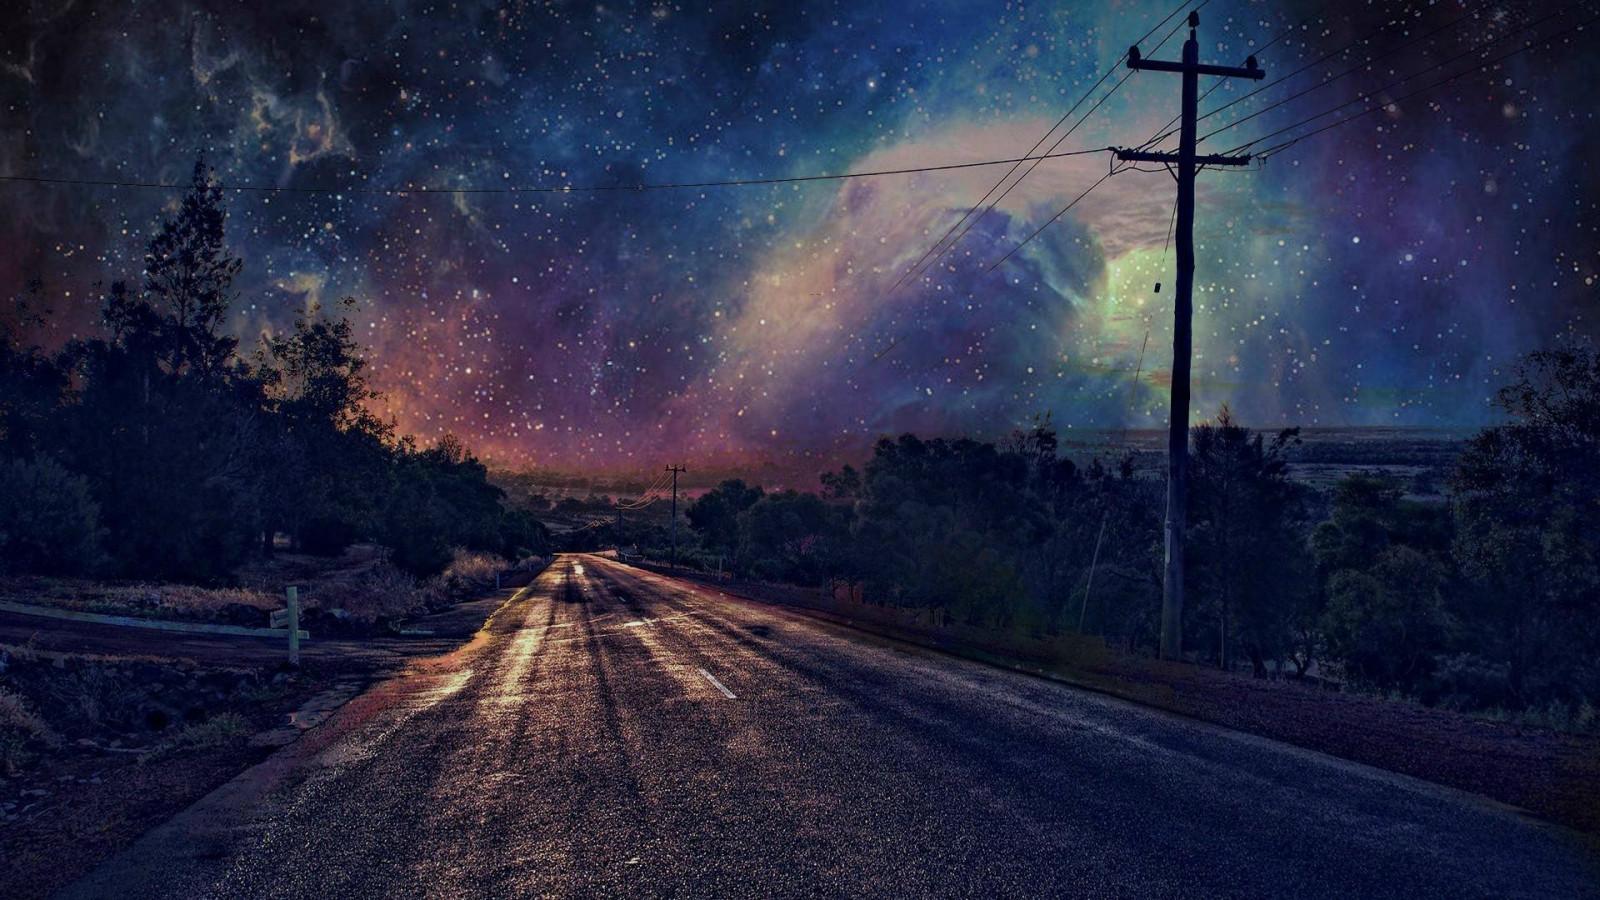 Wallpaper : 1920x1080 px, malam, jalan, bintang, tiang ...